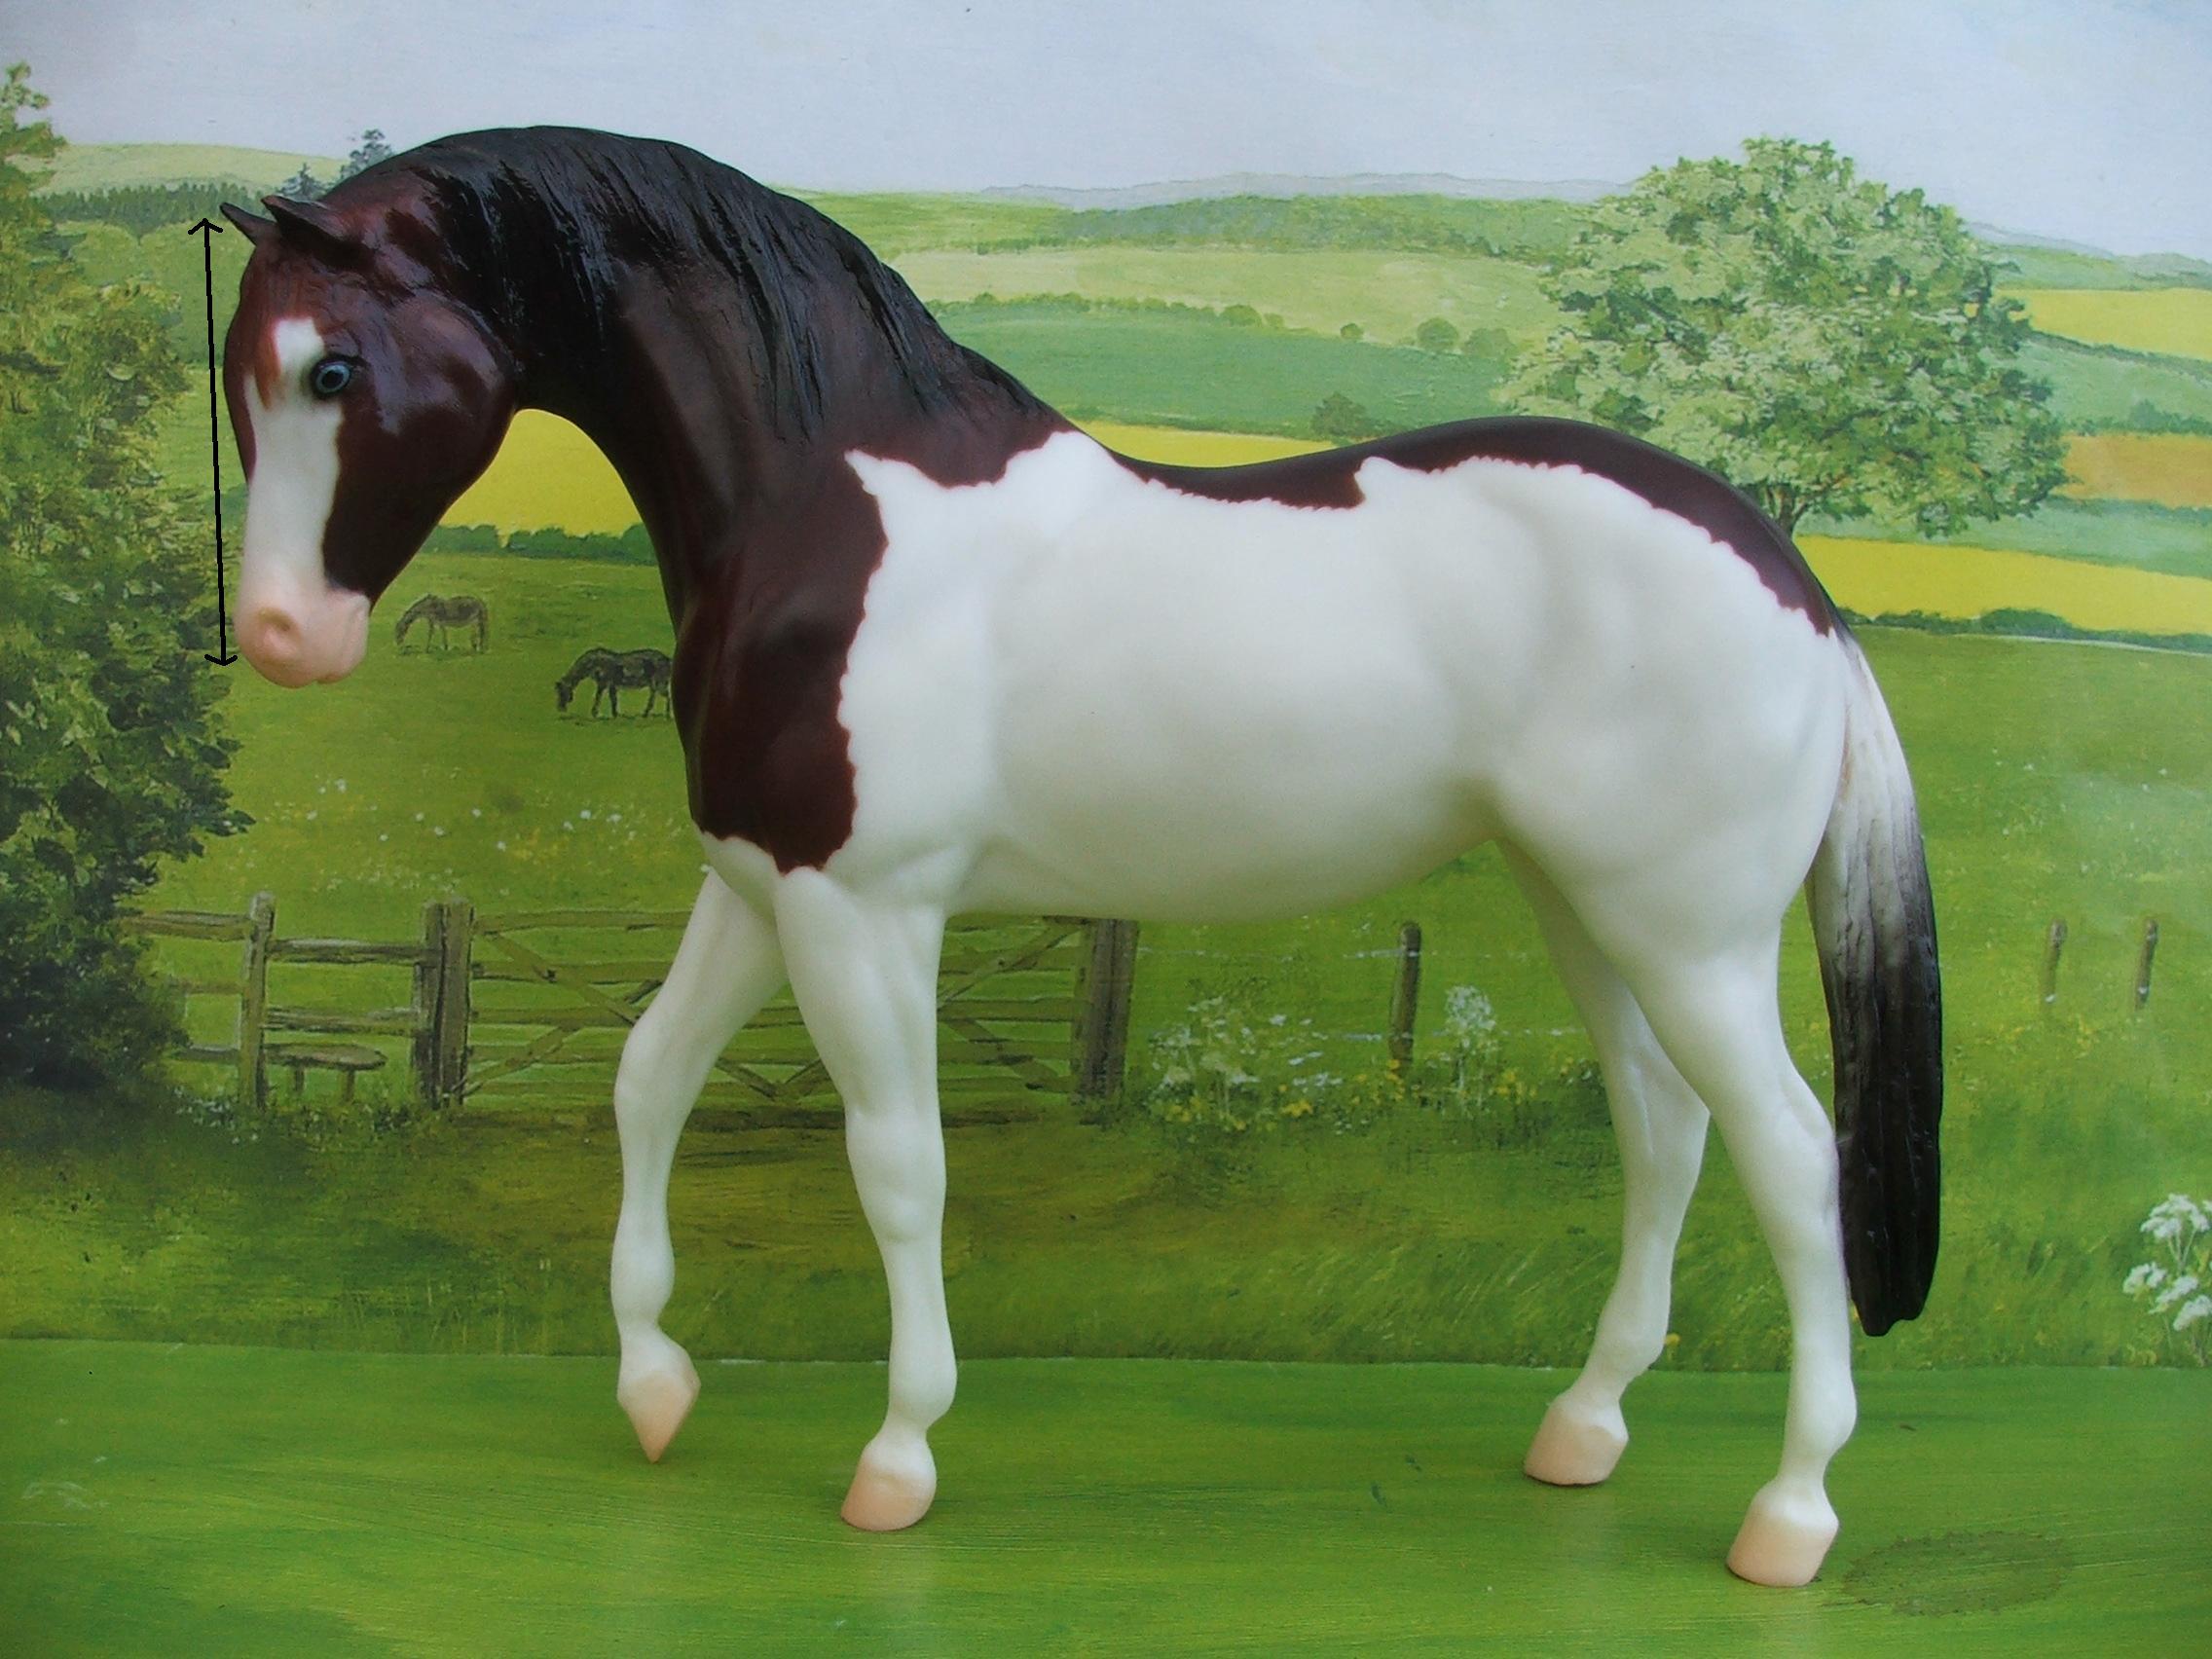 Equine Anatomy & Physiology - Veterinary Terminology